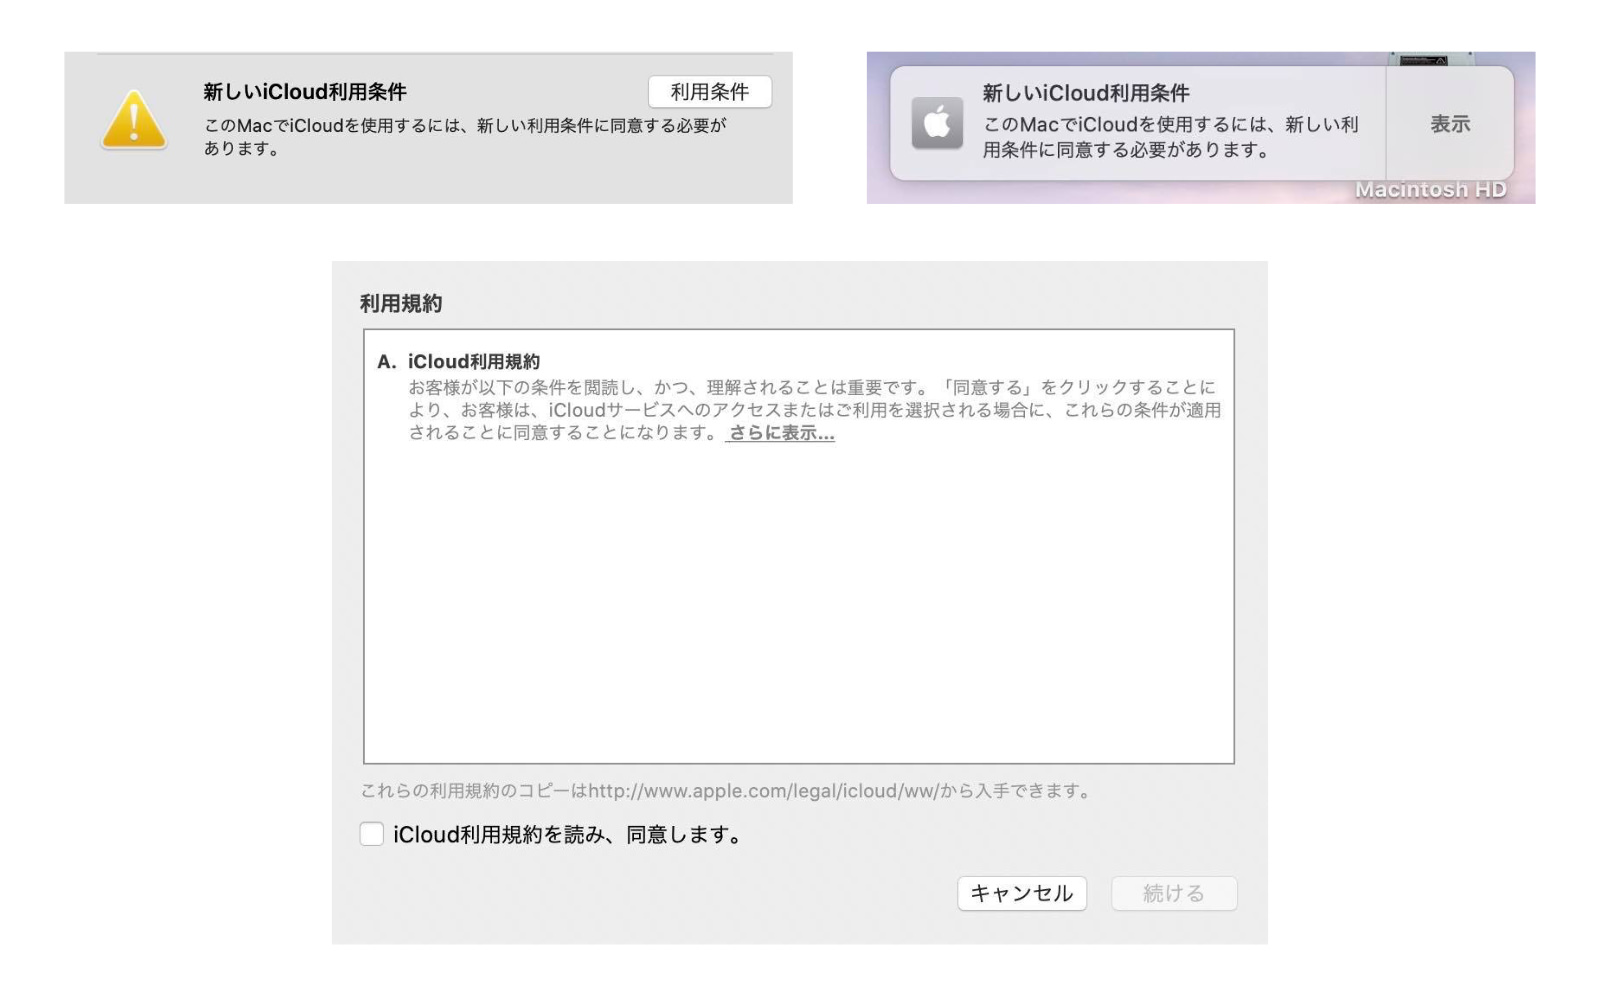 iCloud-Error-message.jpg